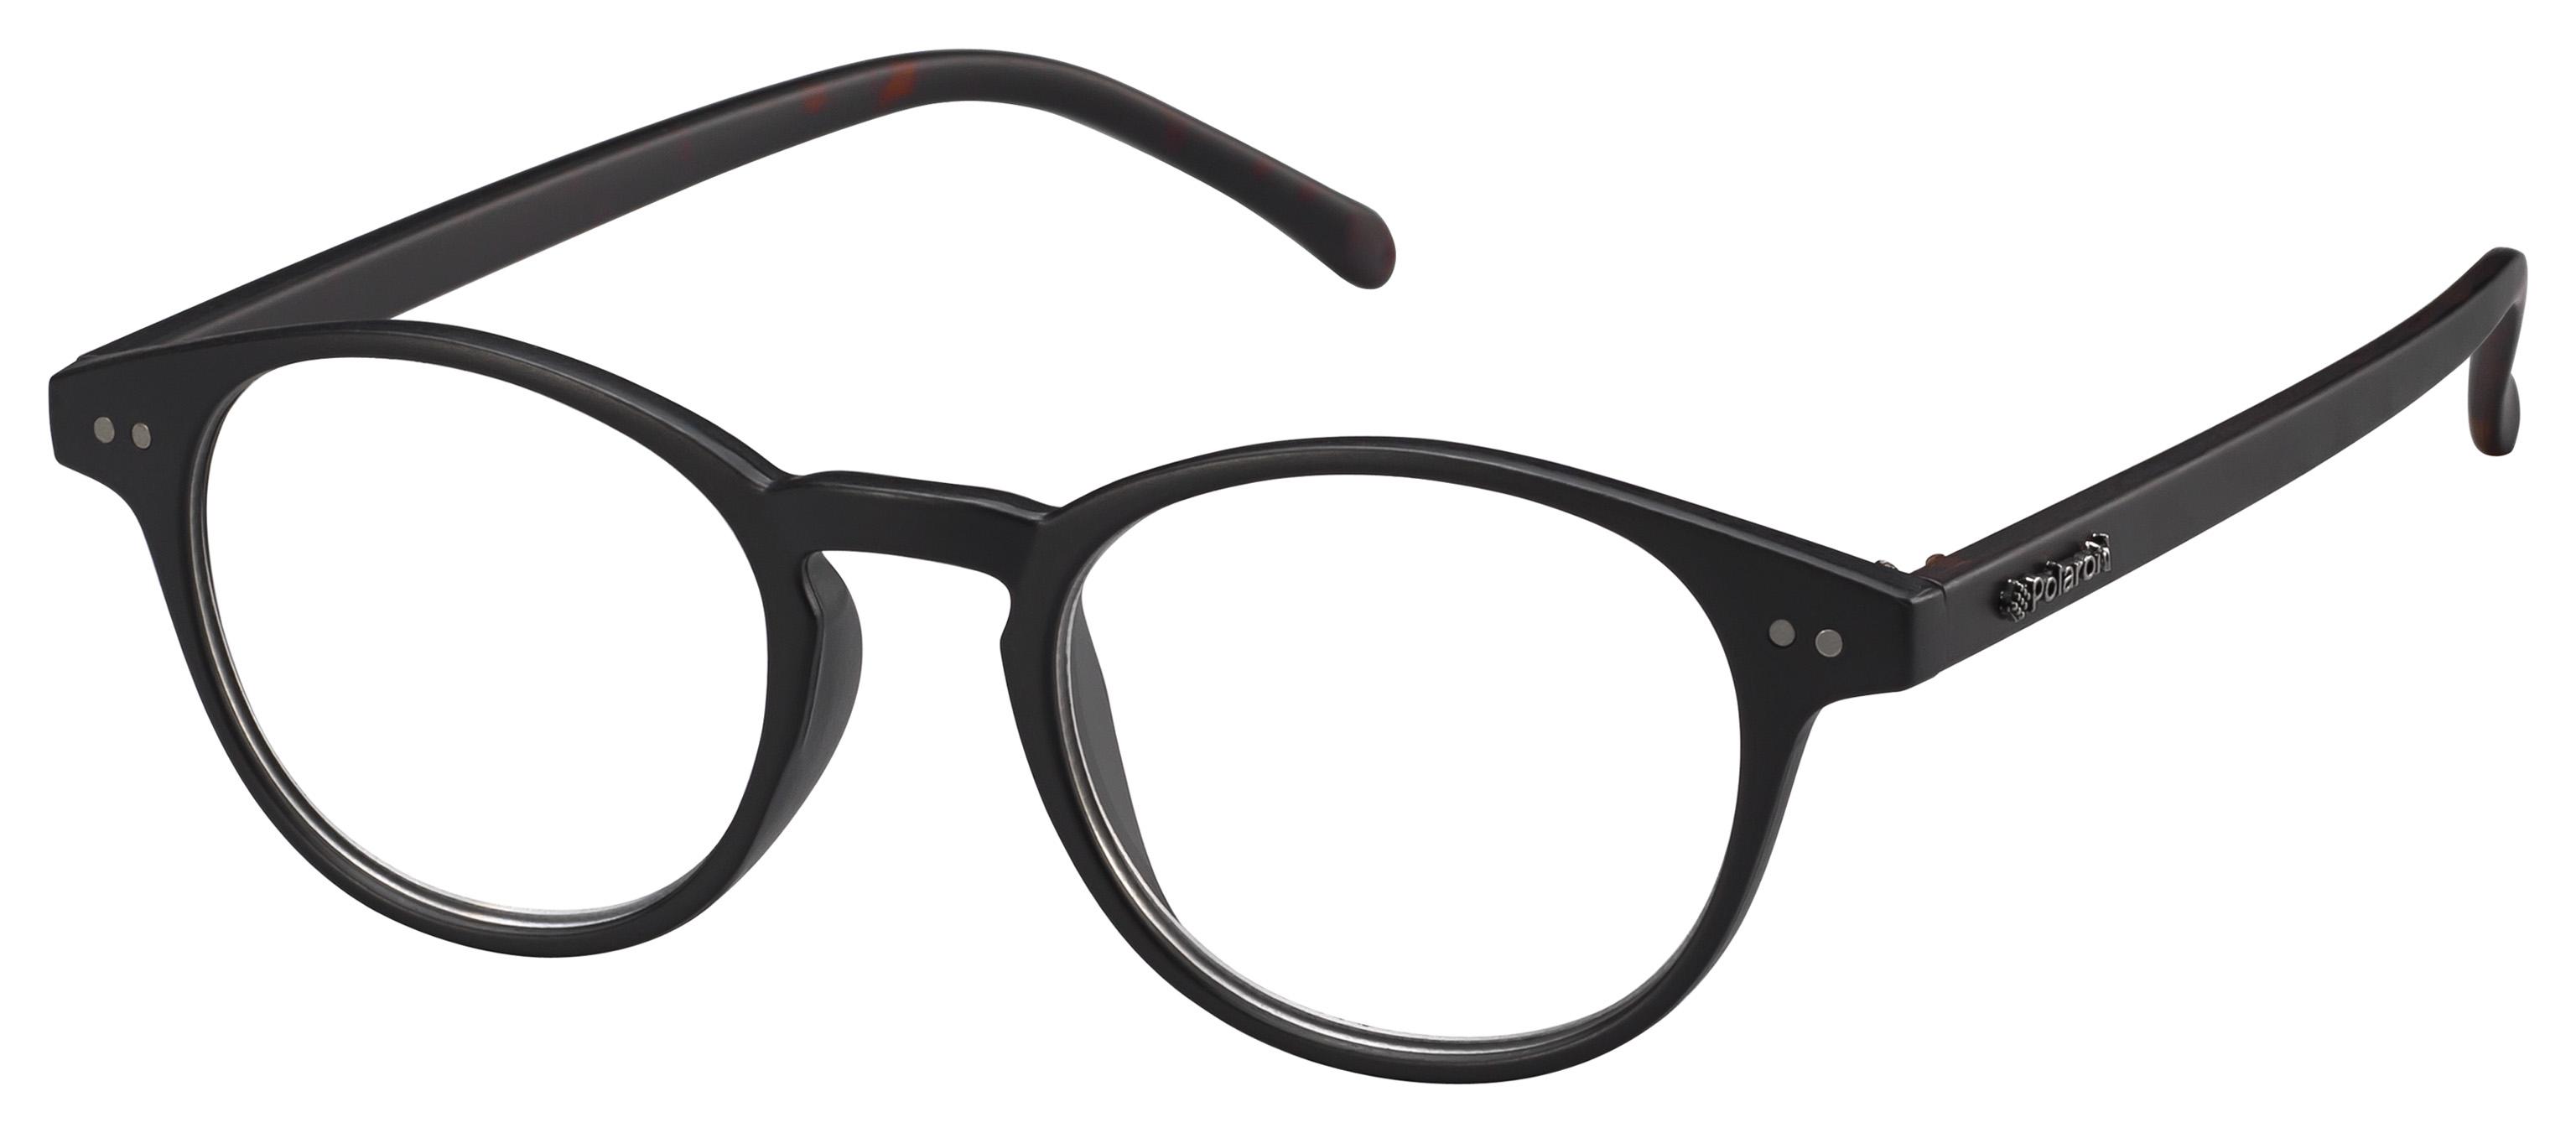 Leesbril Polaroid PLD0008 zwart